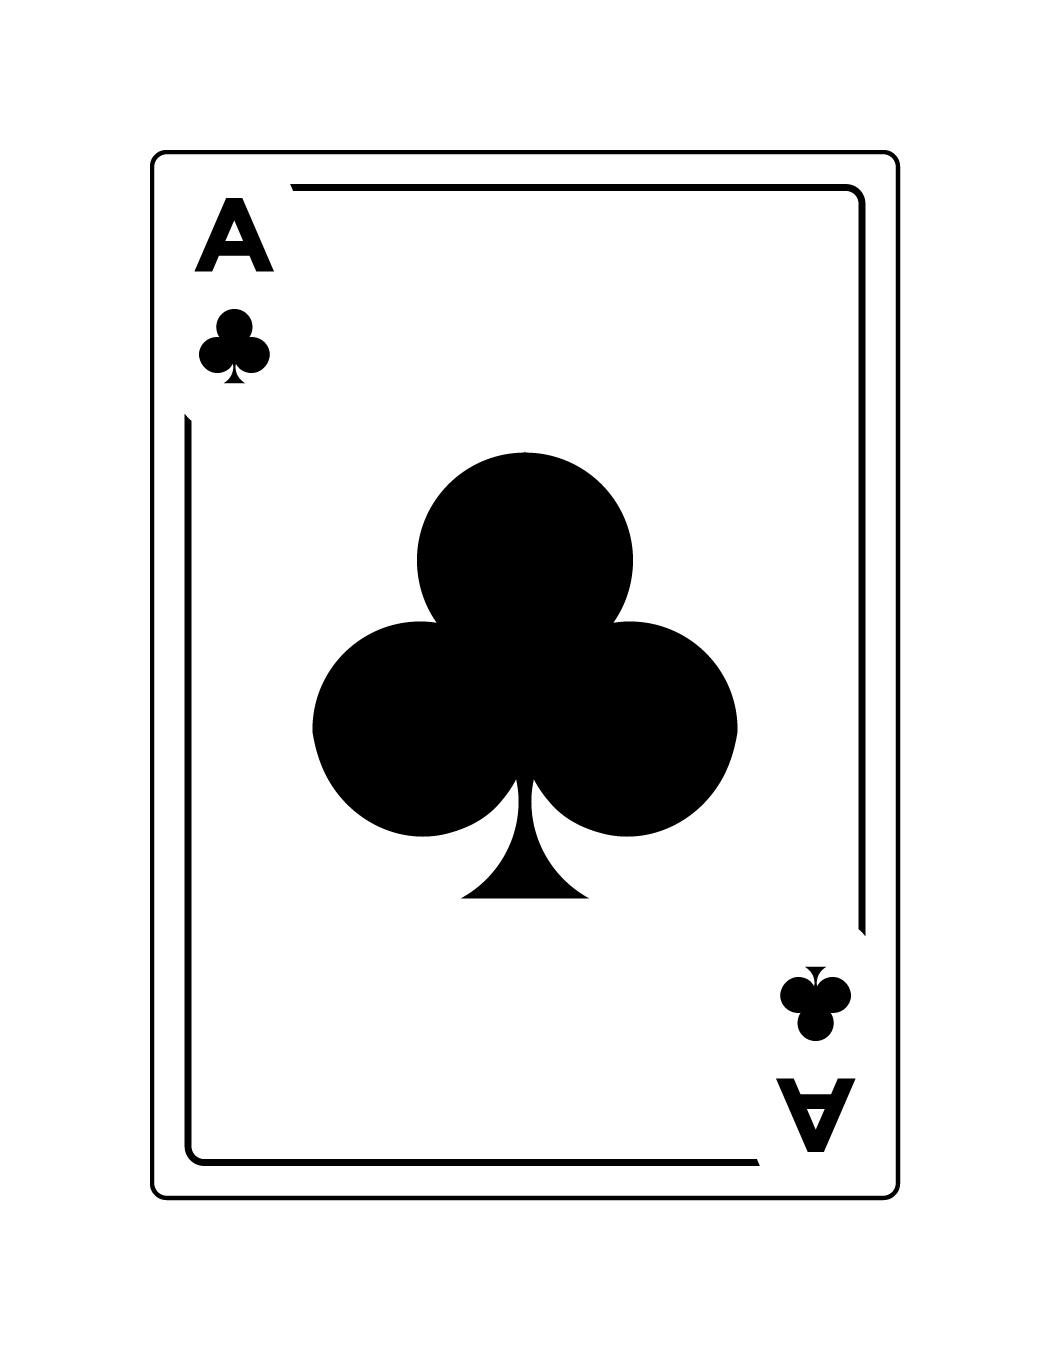 card_draft_1-53.jpg